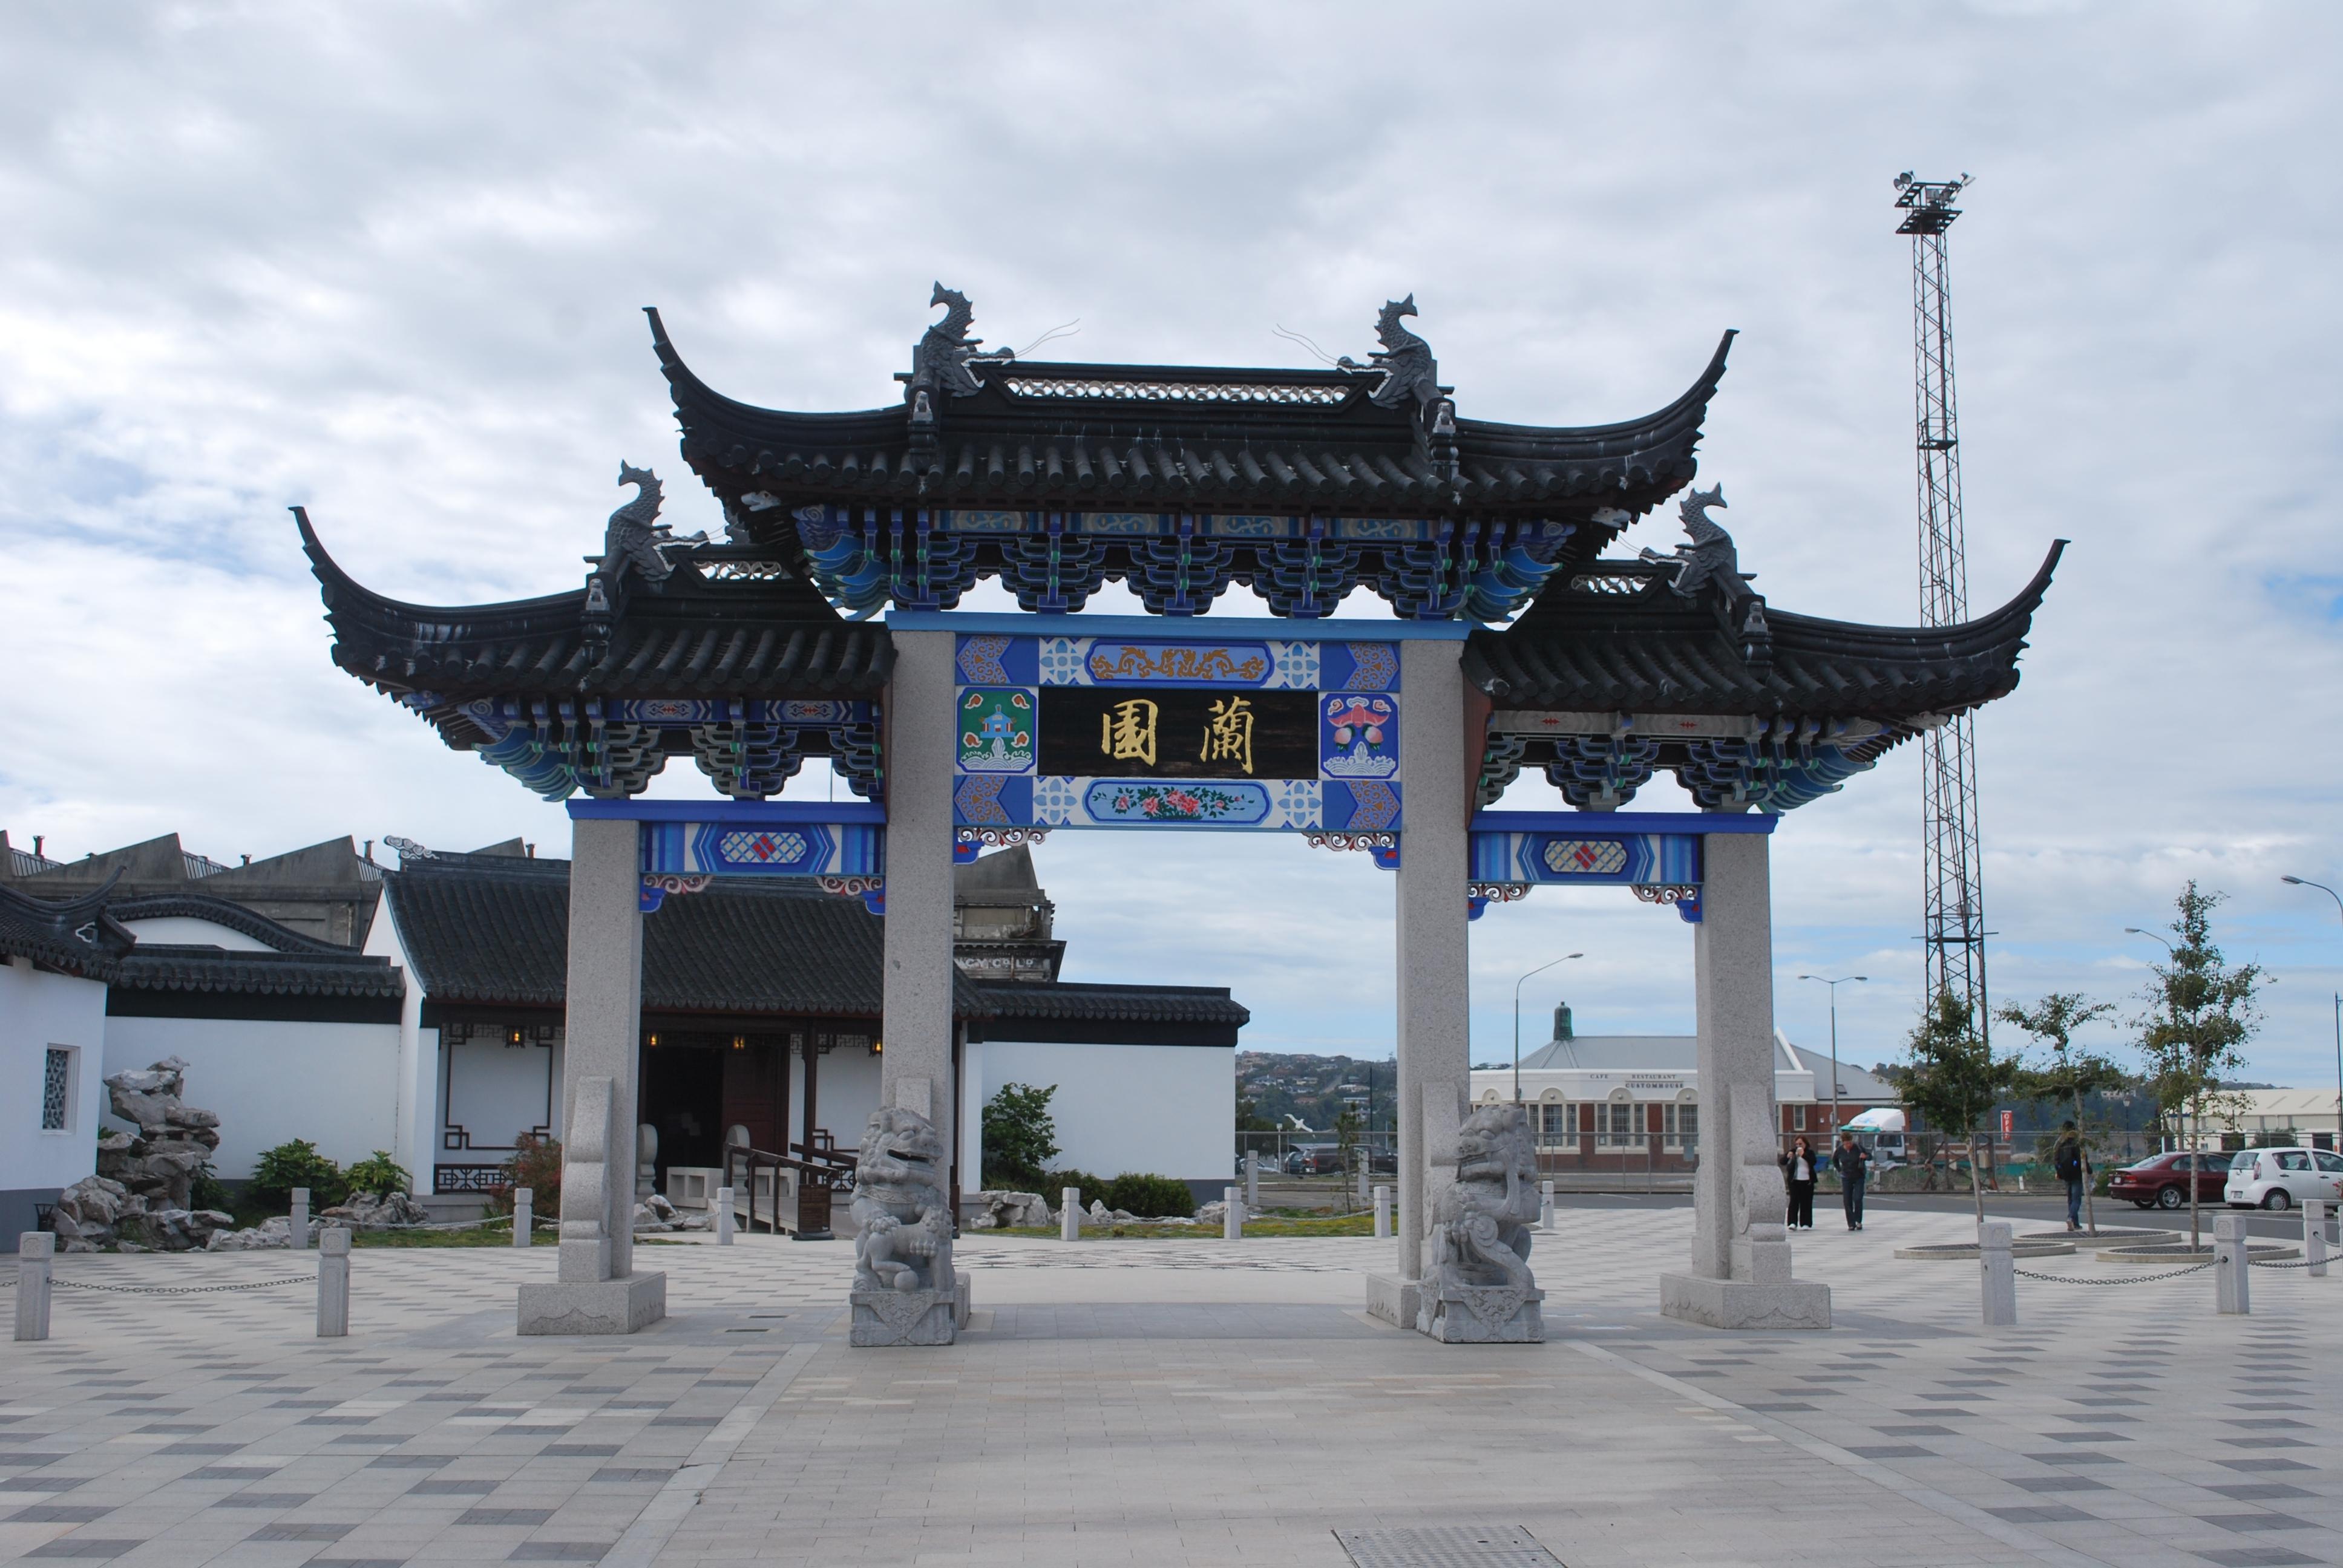 File:Dunedin Chinese Gates.JPG